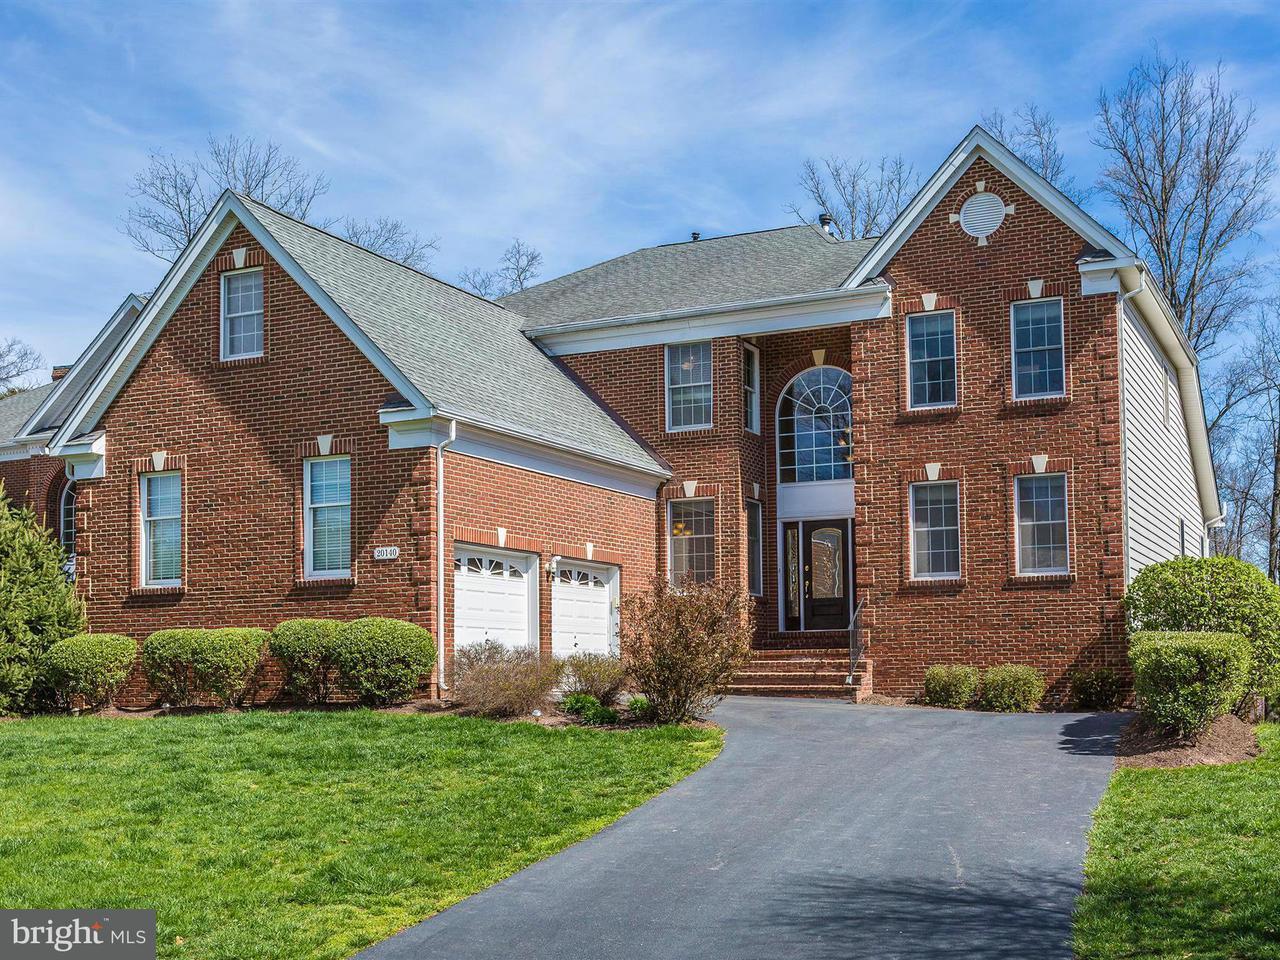 Single Family Home for Sale at 20140 BANDON DUNES Court 20140 BANDON DUNES Court Ashburn, Virginia 20147 United States